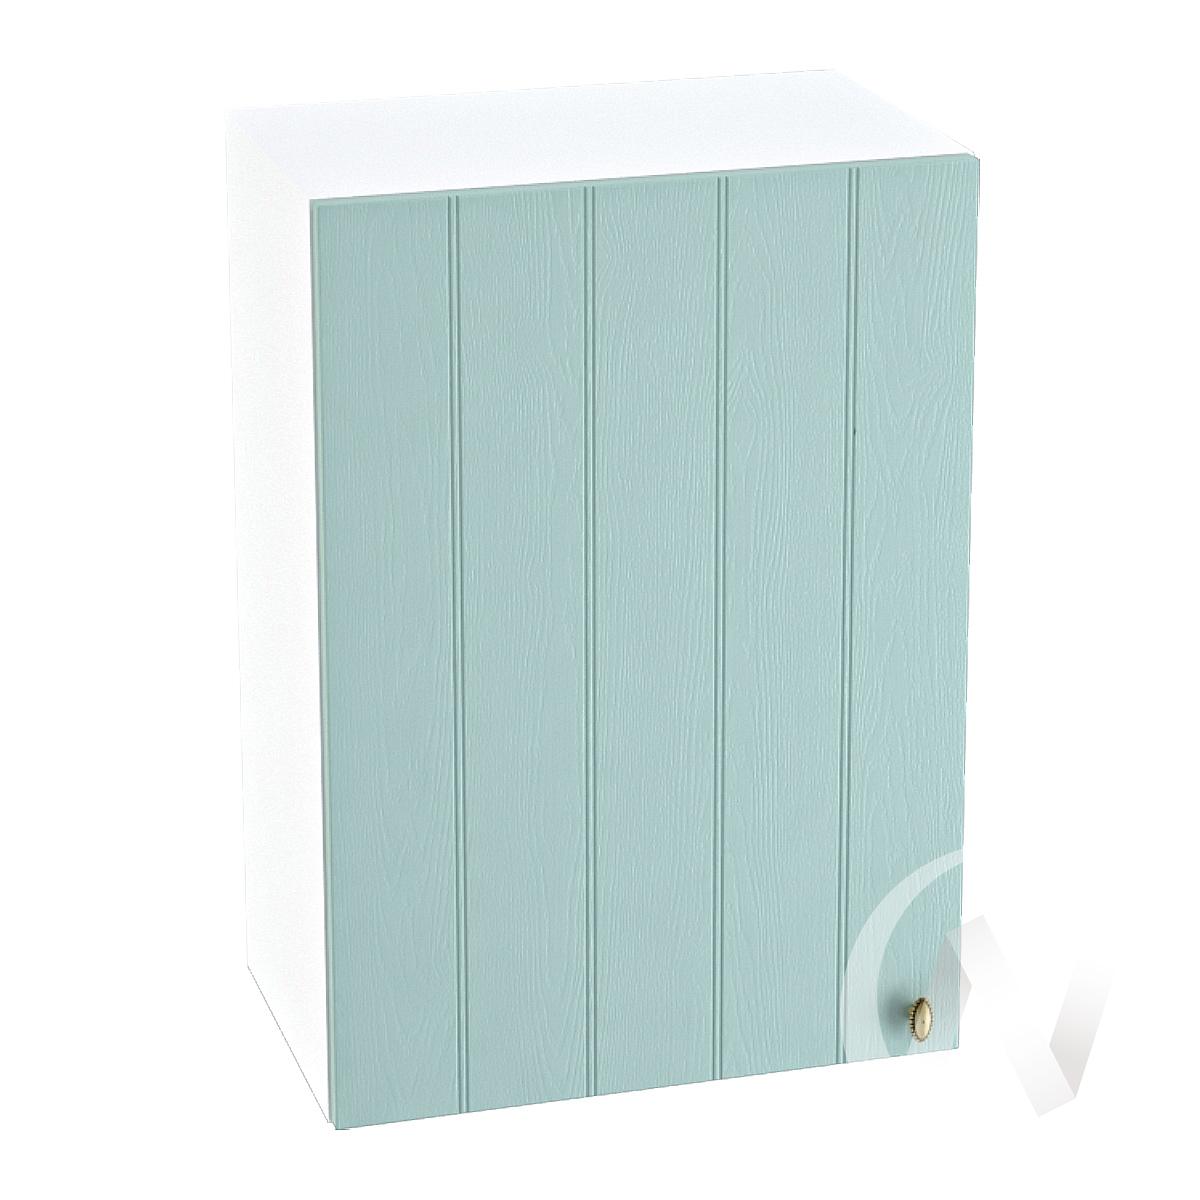 "Кухня ""Прованс"": Шкаф верхний 500, ШВ 500 (голубой/корпус белый)"